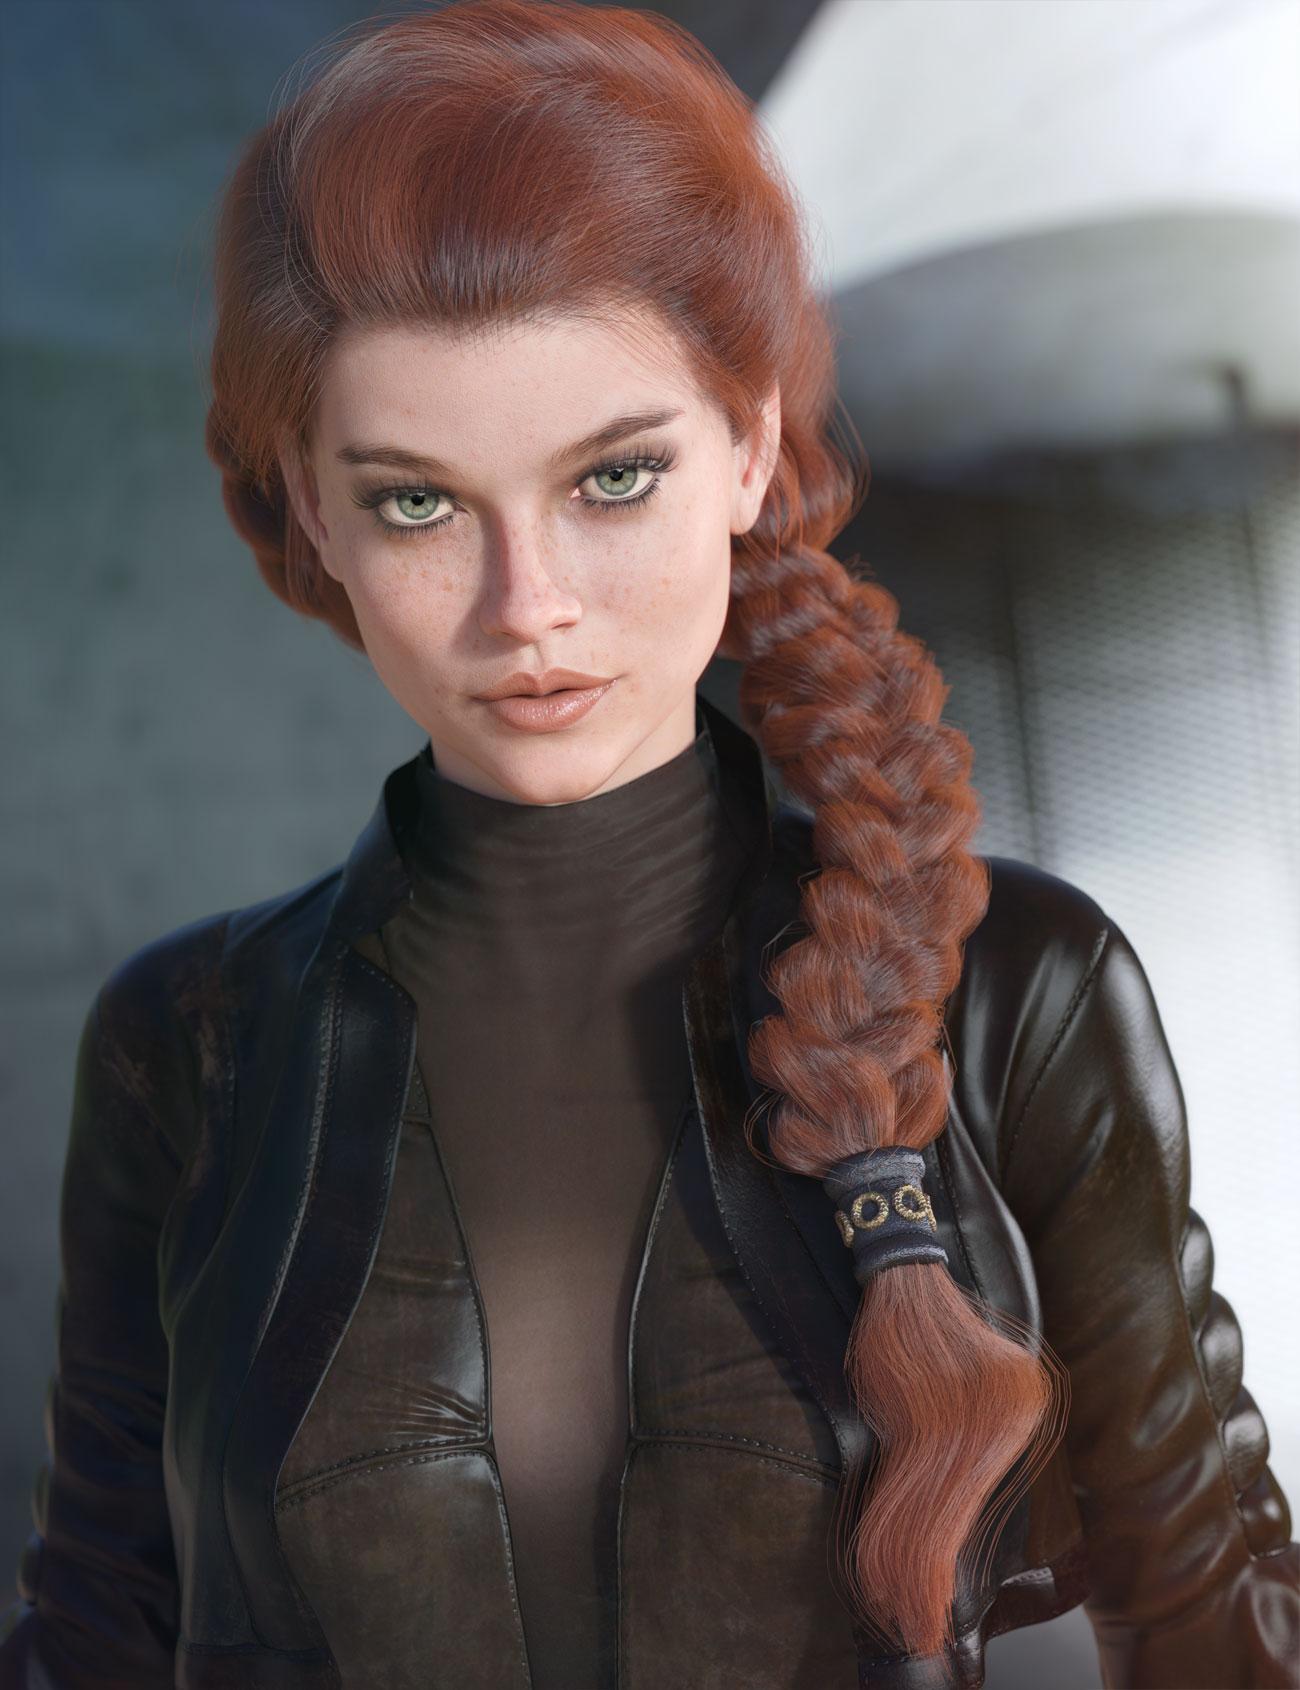 dForce Tara Hair for Genesis 3 and 8 Female(s) by: Tristan Liu, 3D Models by Daz 3D